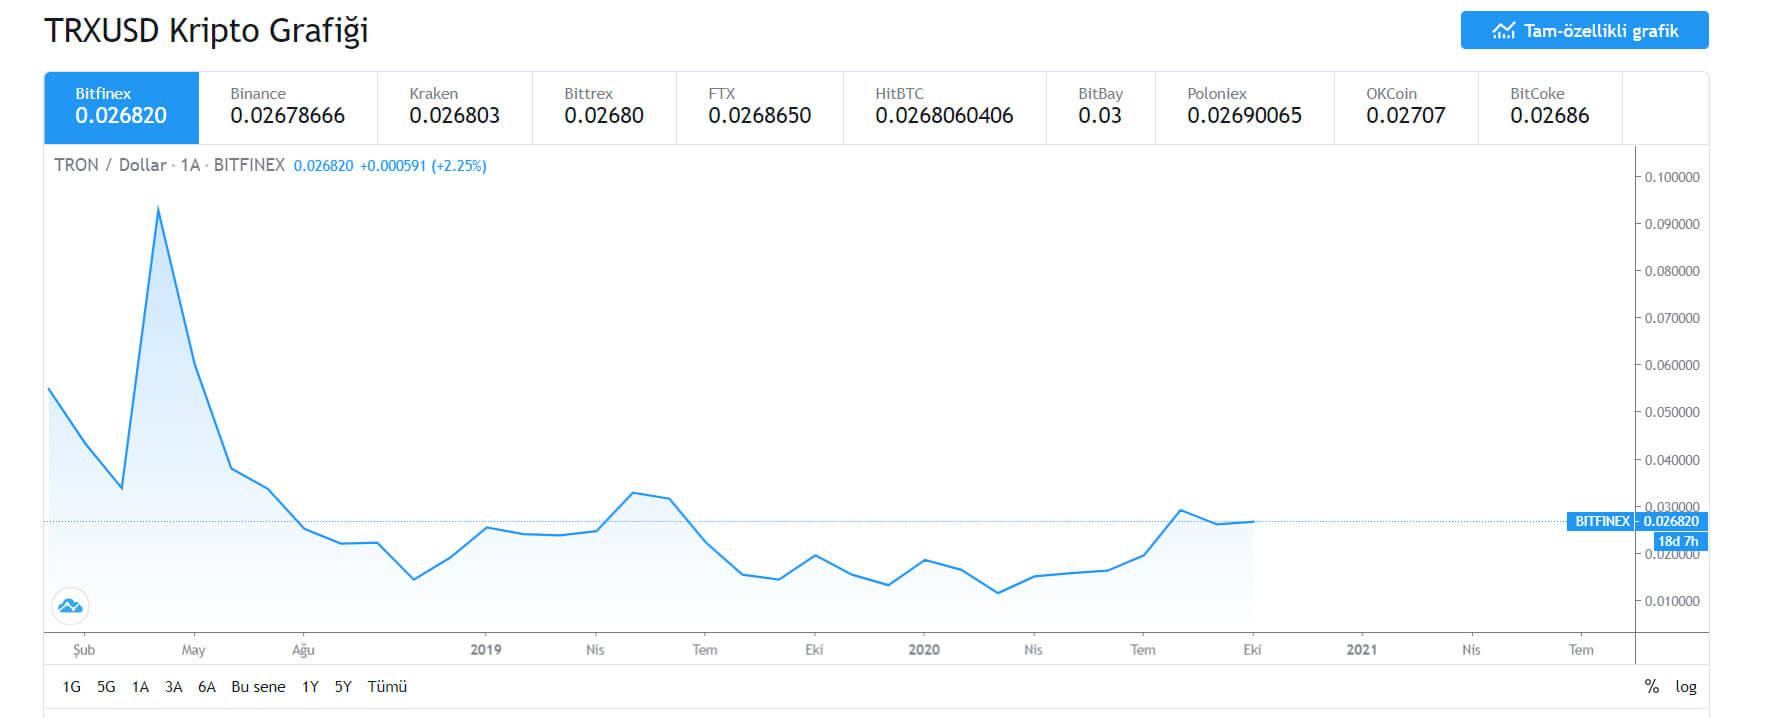 TRON (TRX) Coin fiyat grafik tablosu.